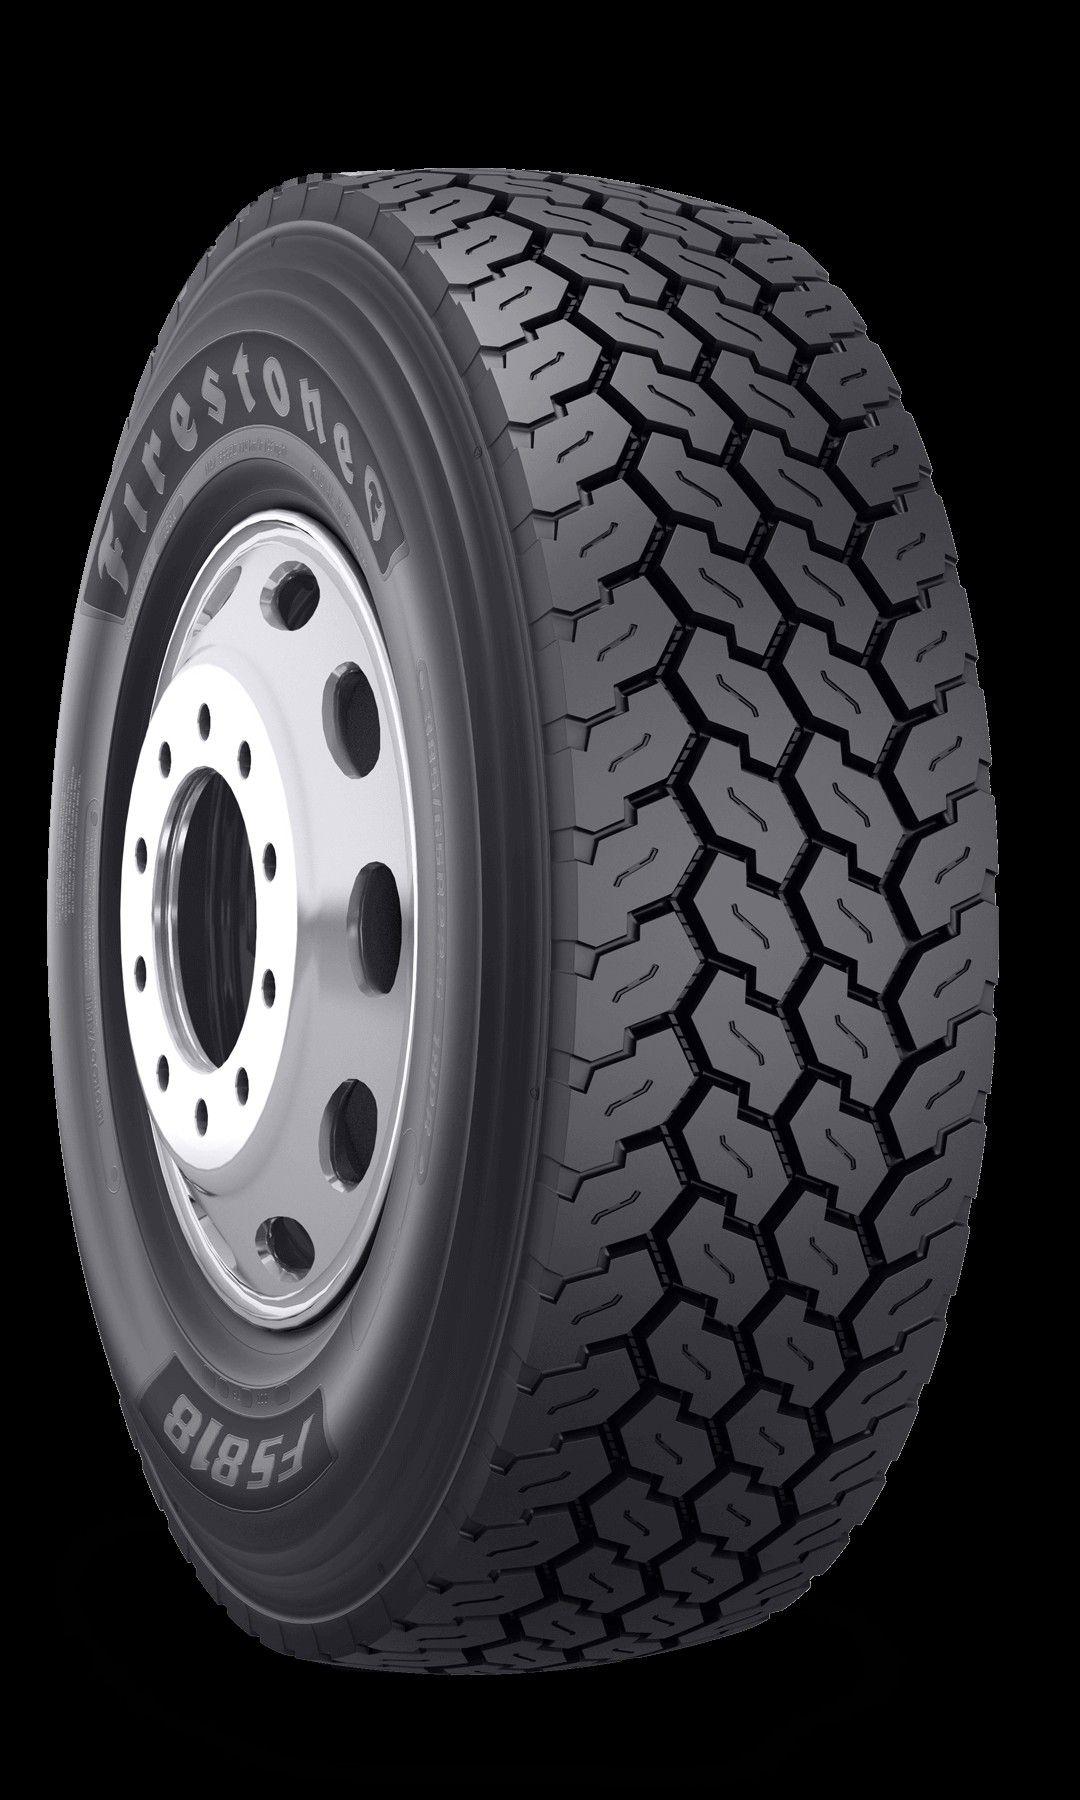 Falken Tire Coupons Wheels Tires Gallery Pinterest